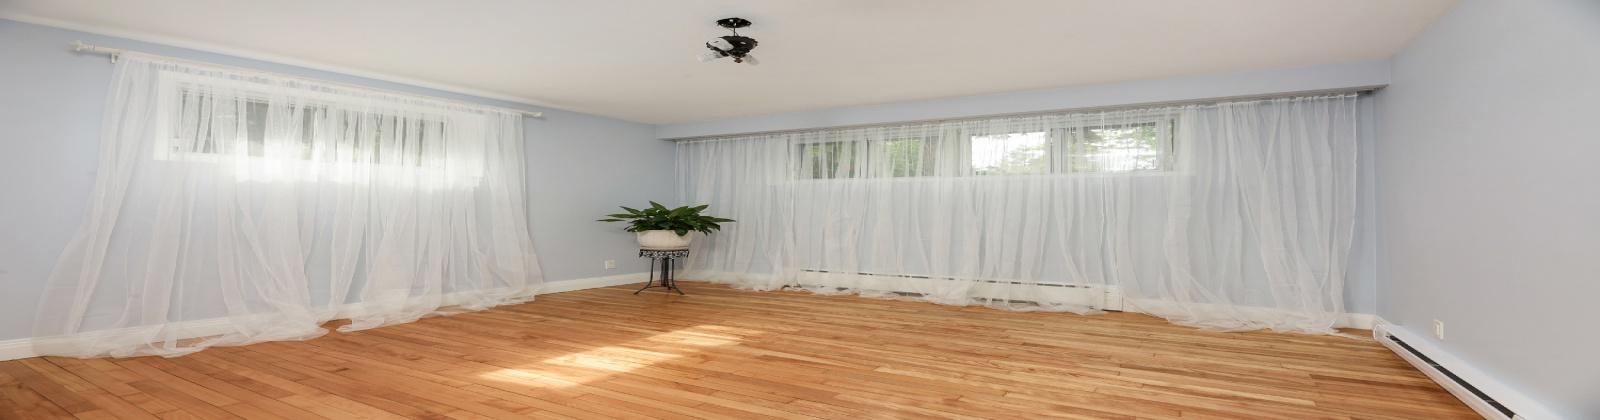 5 Bedrooms Bedrooms, ,3 BathroomsBathrooms,Maison,For Sale,1039